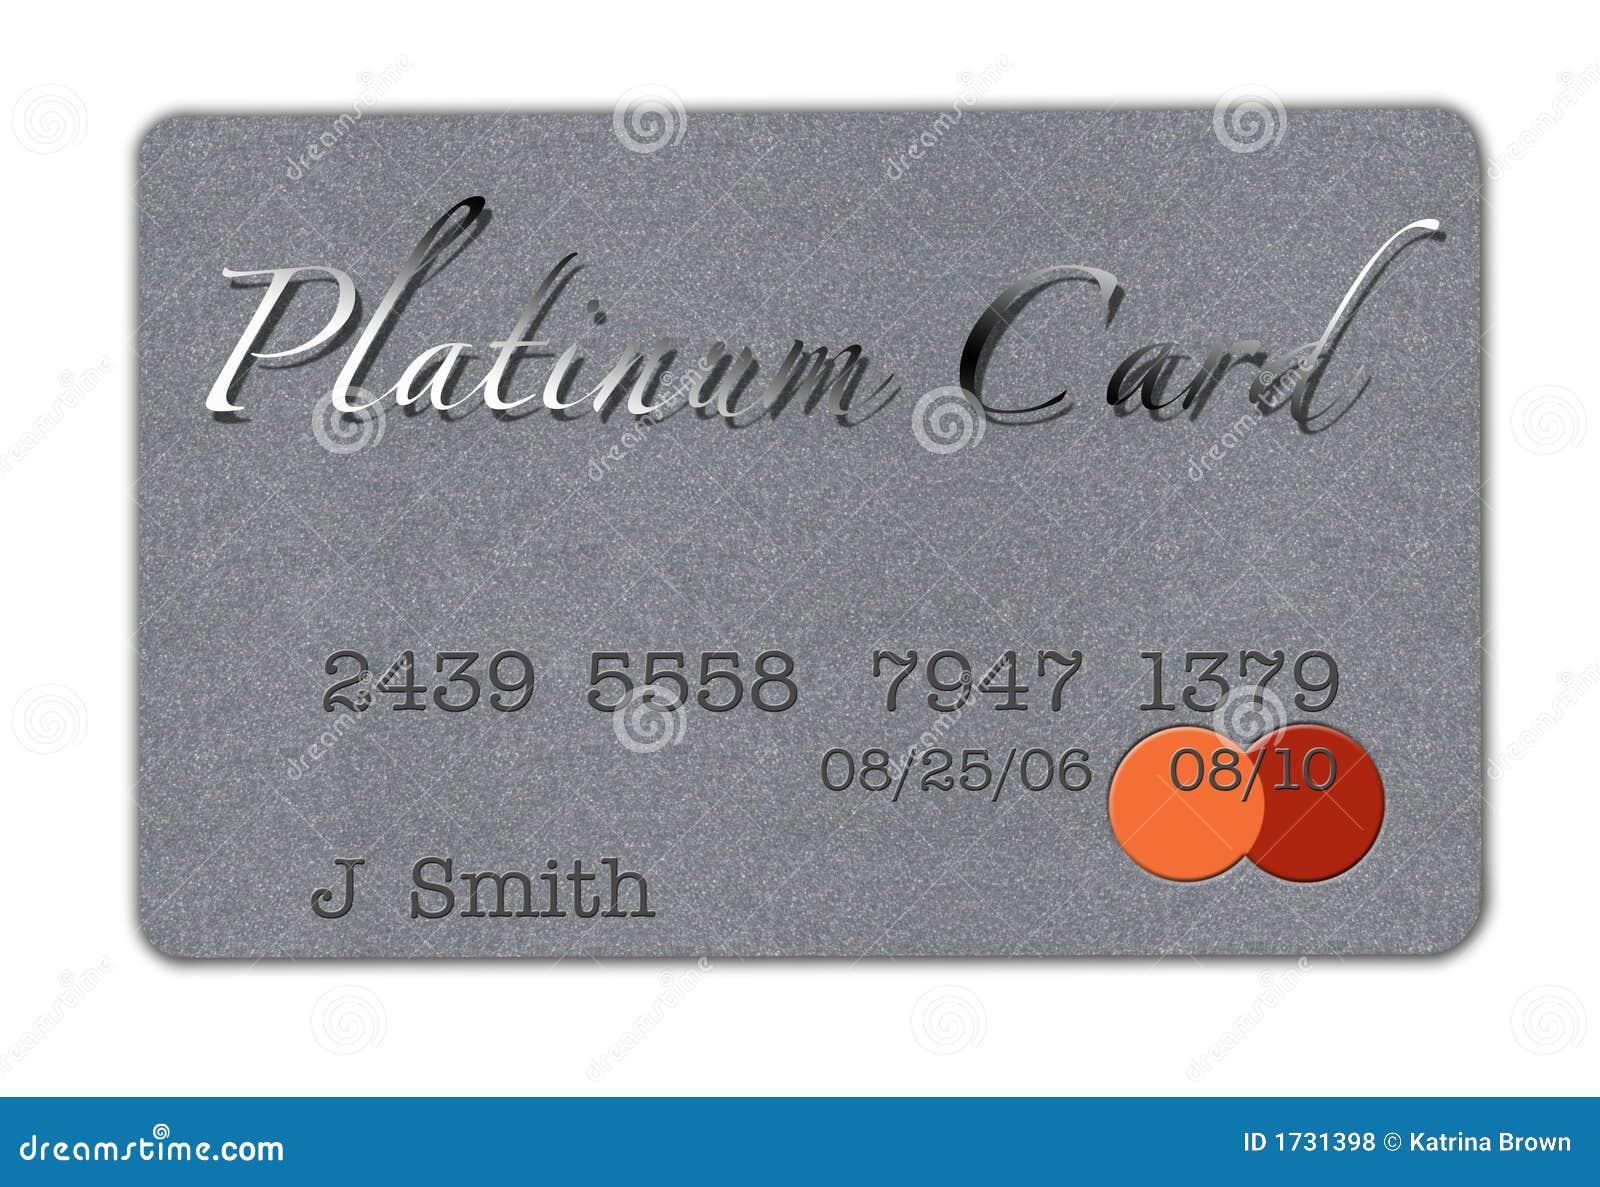 Platinum credit card stock illustration illustration of debit 1731398 platinum credit card publicscrutiny Gallery